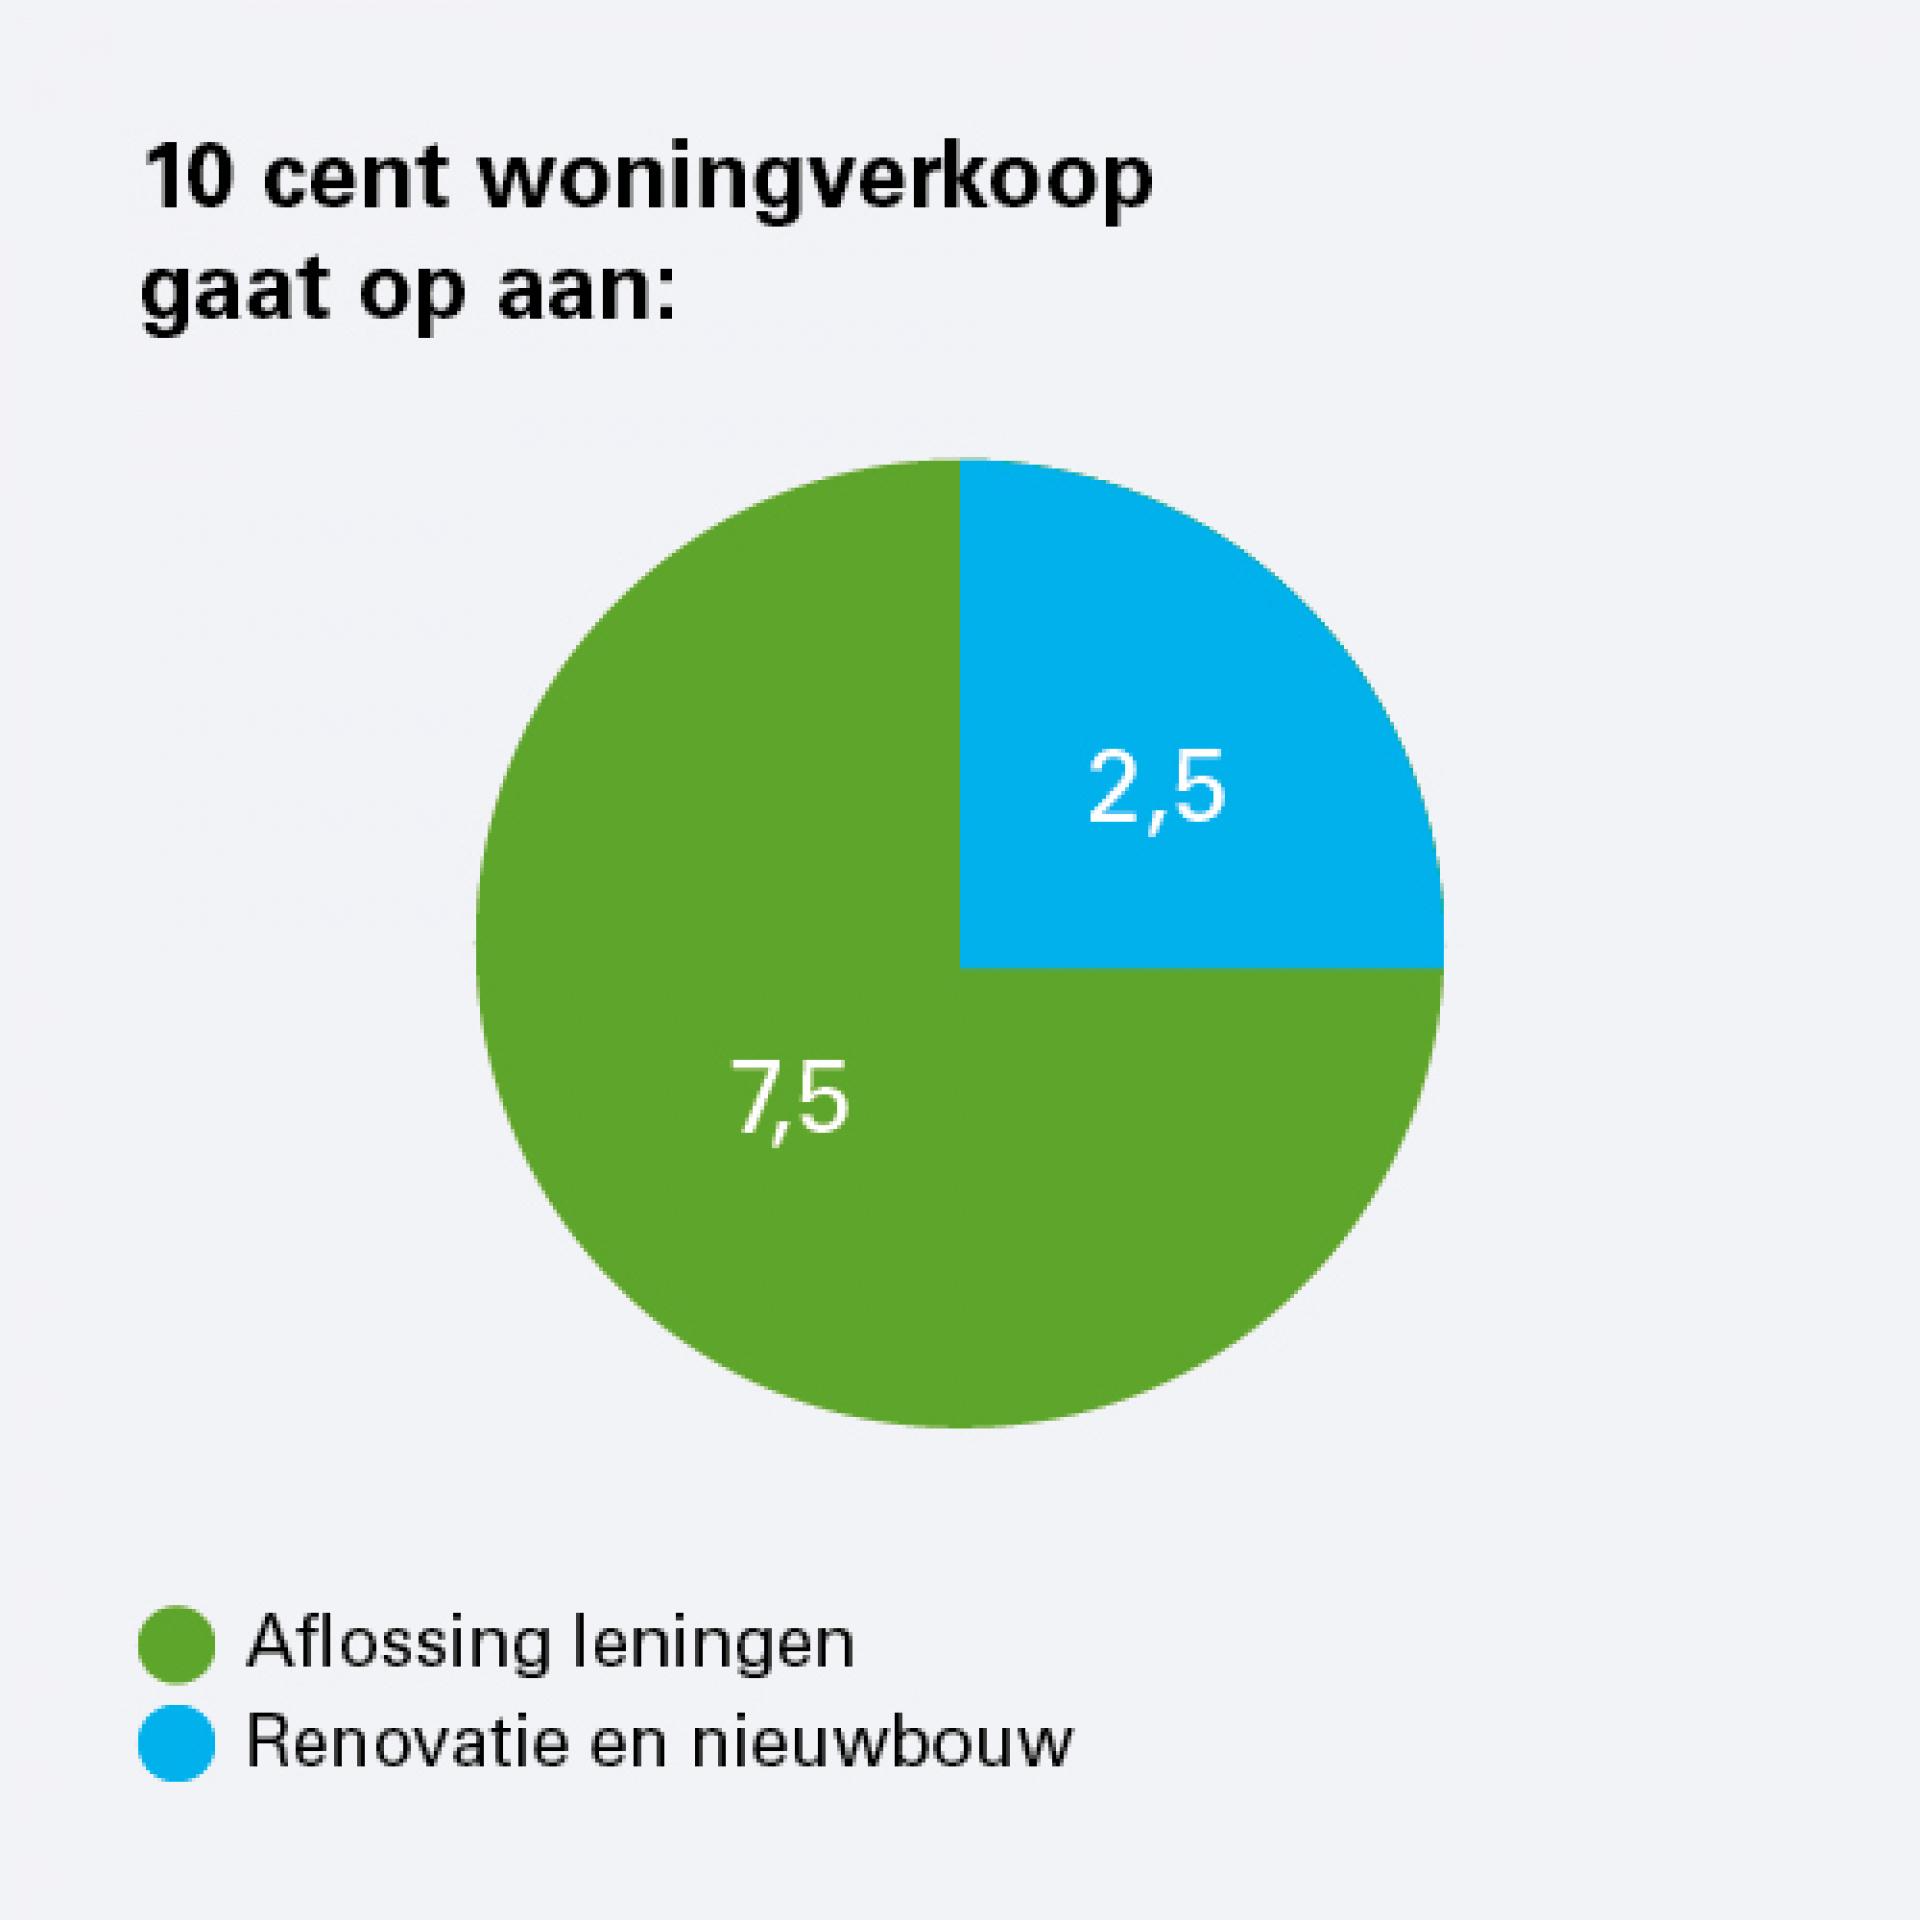 10 cent woningverkoop_ronduit.jpg